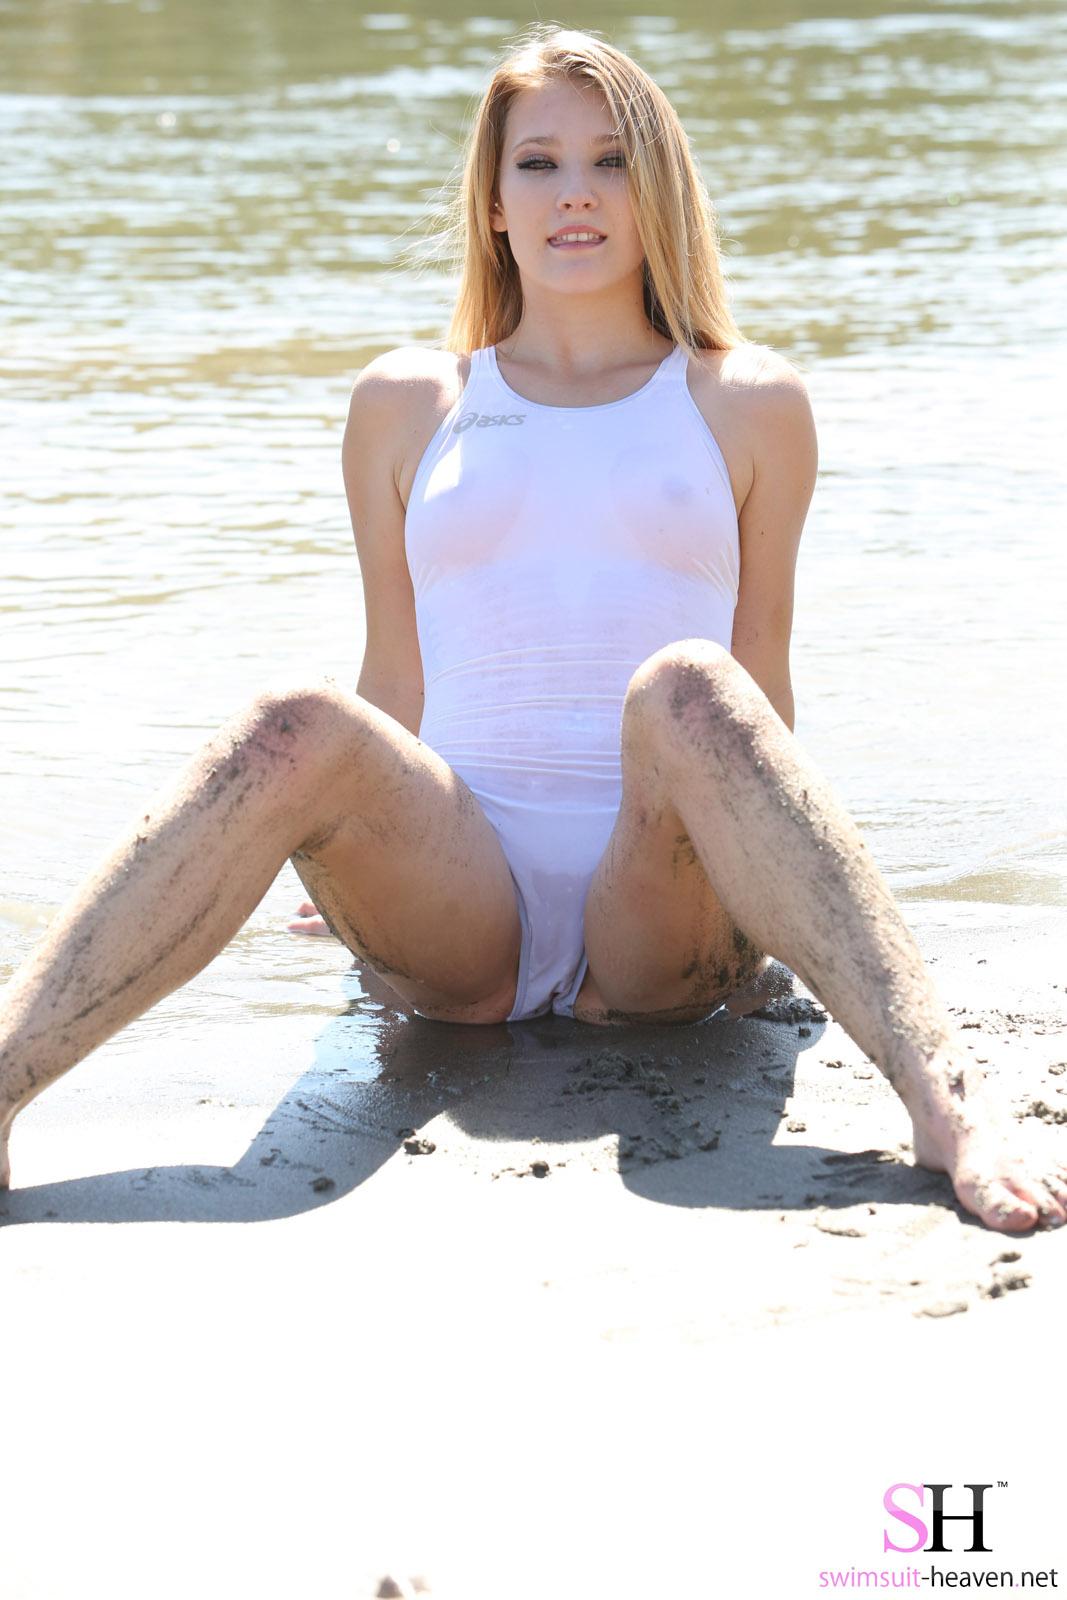 Swimsuit heaven model nude remarkable, very